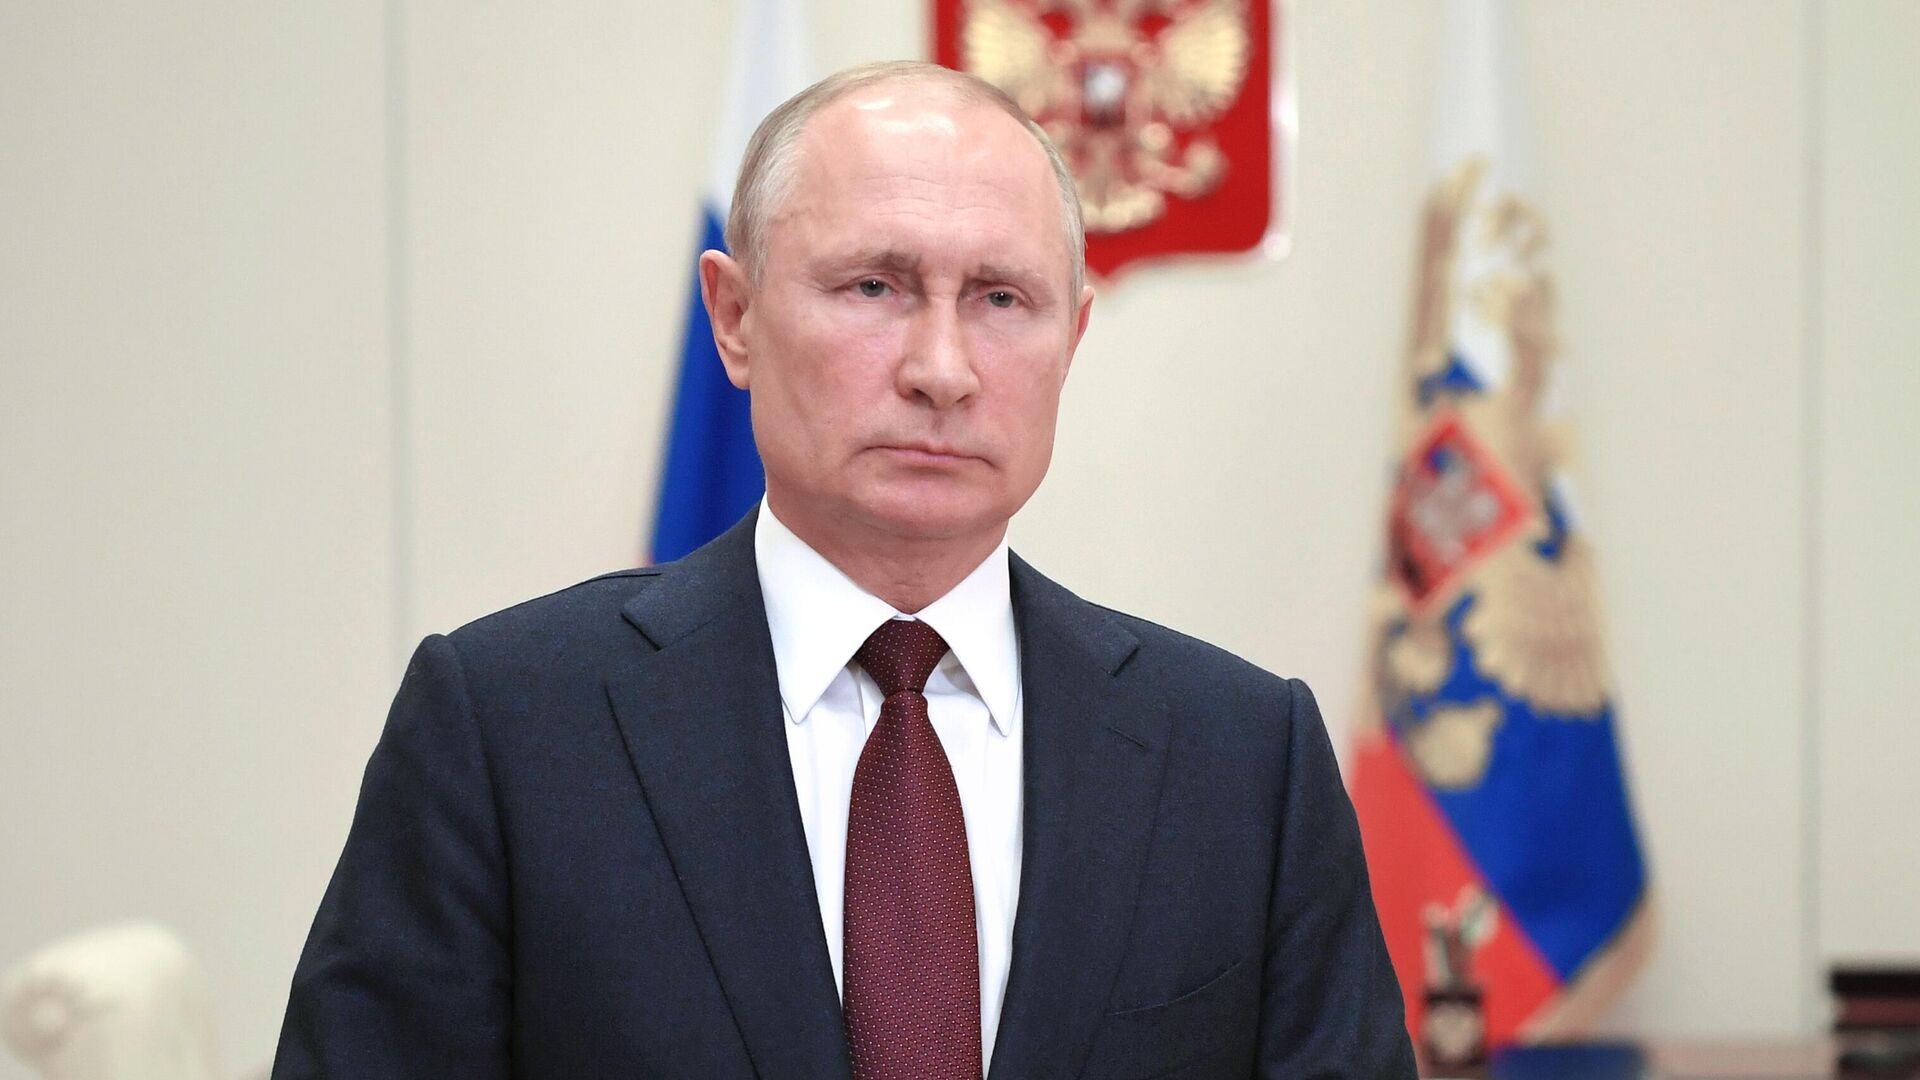 1572096483 0:170:3035:1877 1920x0 80 0 0 12bb2844e5333565a3afb19a75ad5f69 - Путин обратится к участникам Форума регионов в Минске